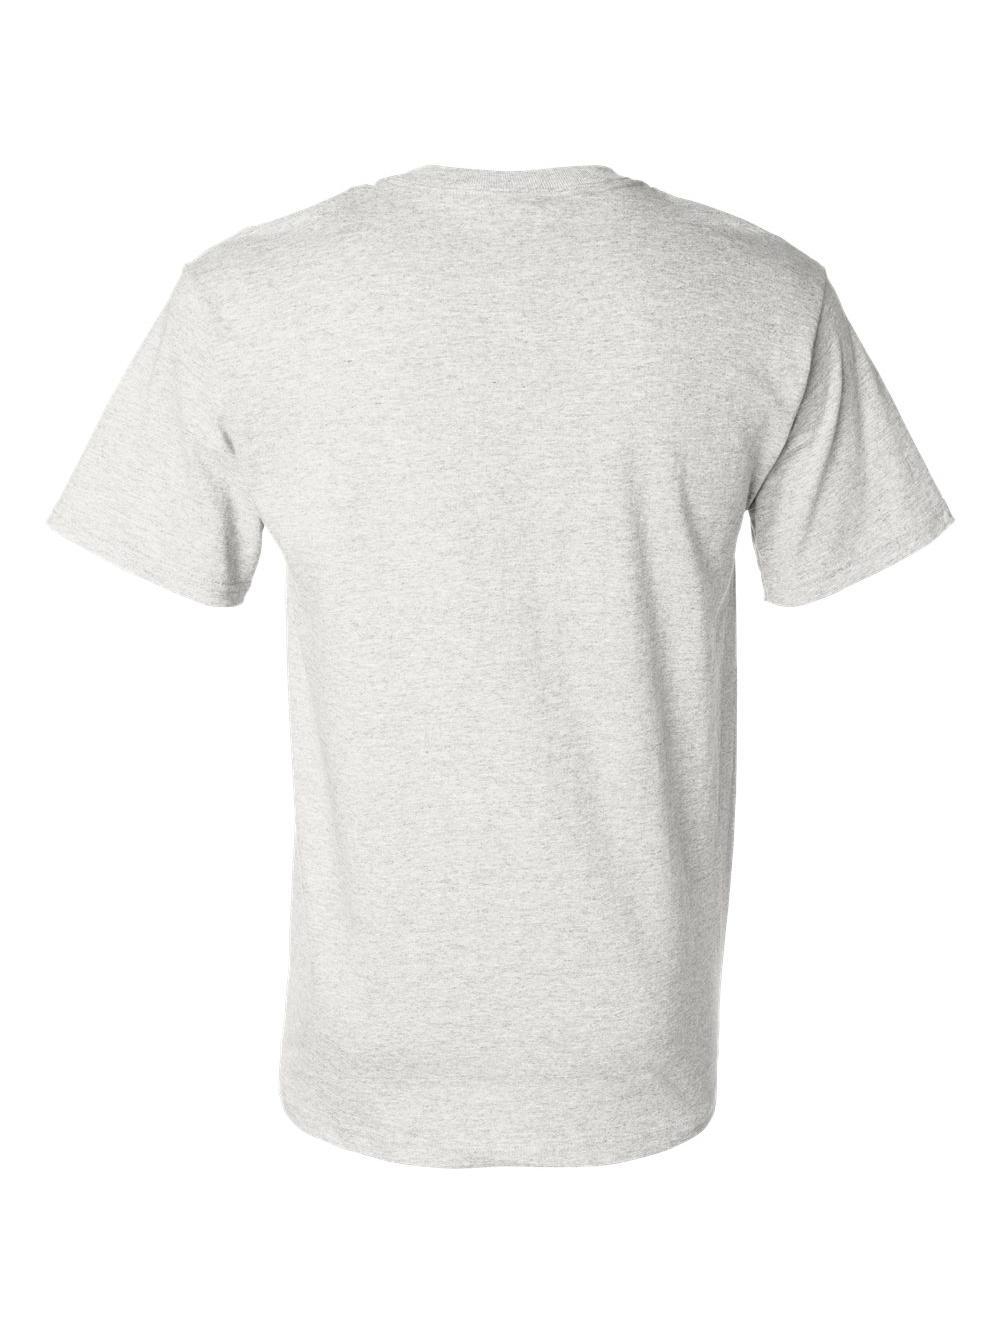 Fruit-of-the-Loom-HD-Cotton-Short-Sleeve-T-Shirt-3930R thumbnail 10